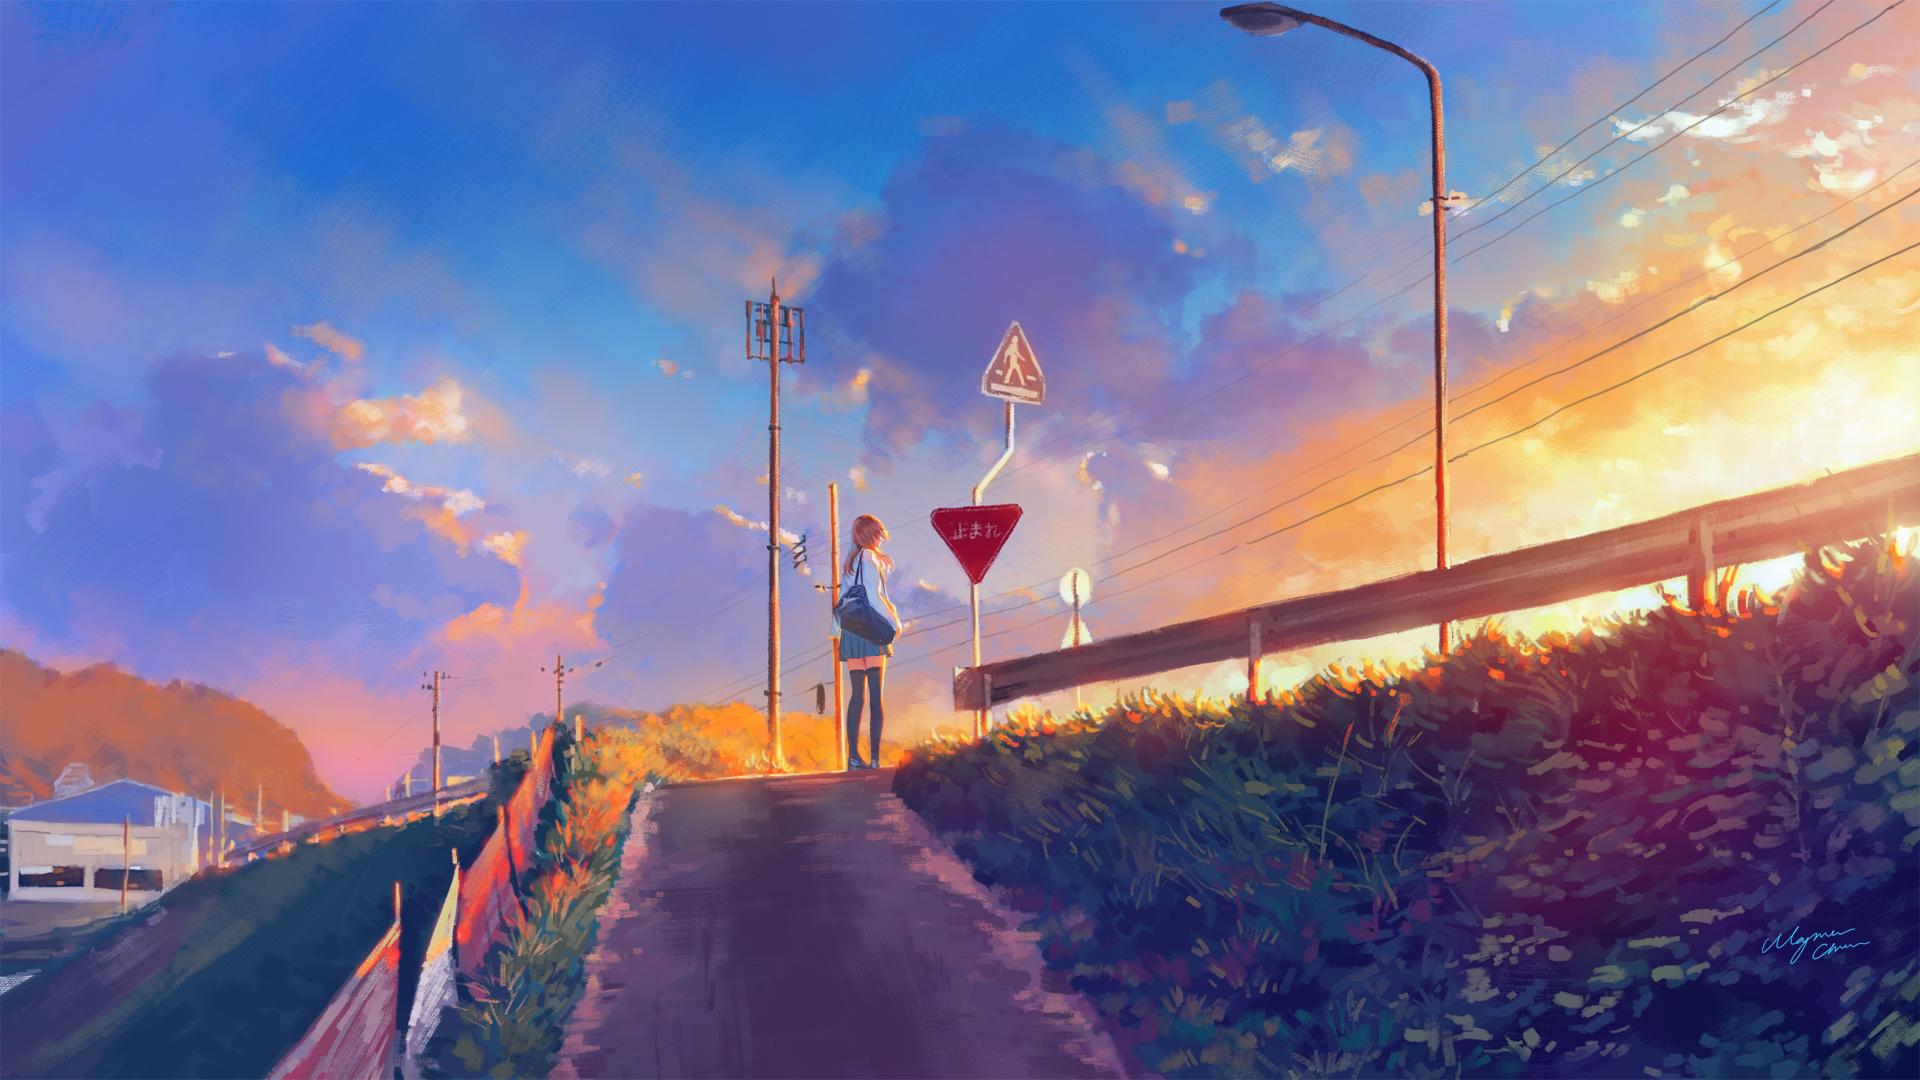 Anime 1920x1080 anime anime girls sunlight sky outdoors